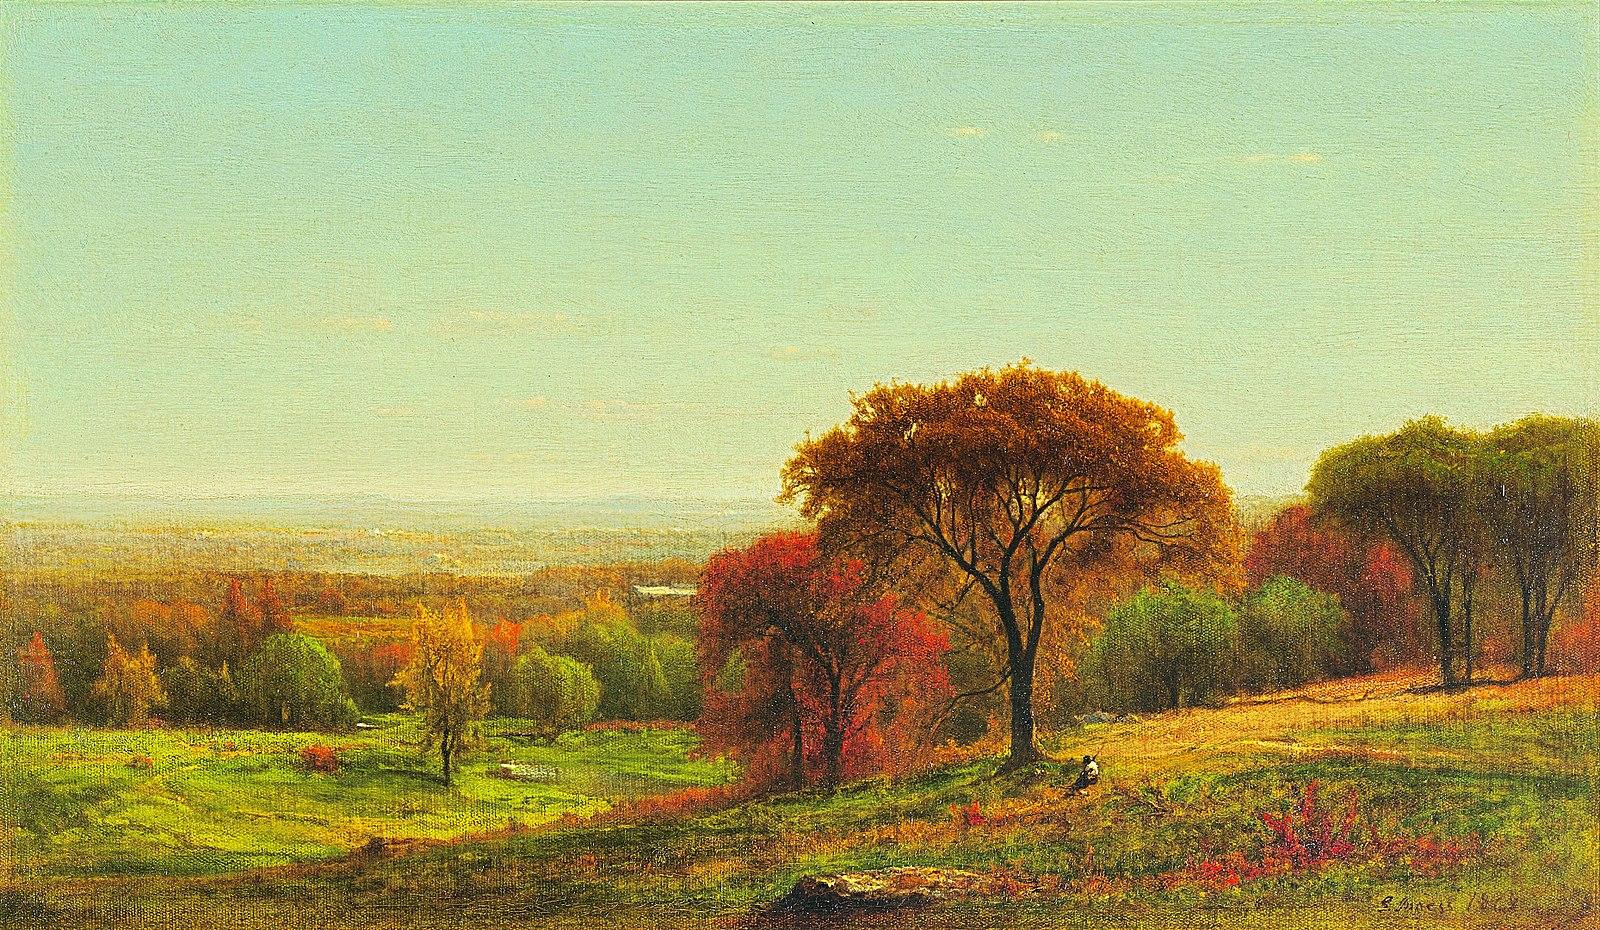 1600px-HRSOA_GeorgeInness-Across_Hudson_Valley_Foothills_Catskills_1868.jpg